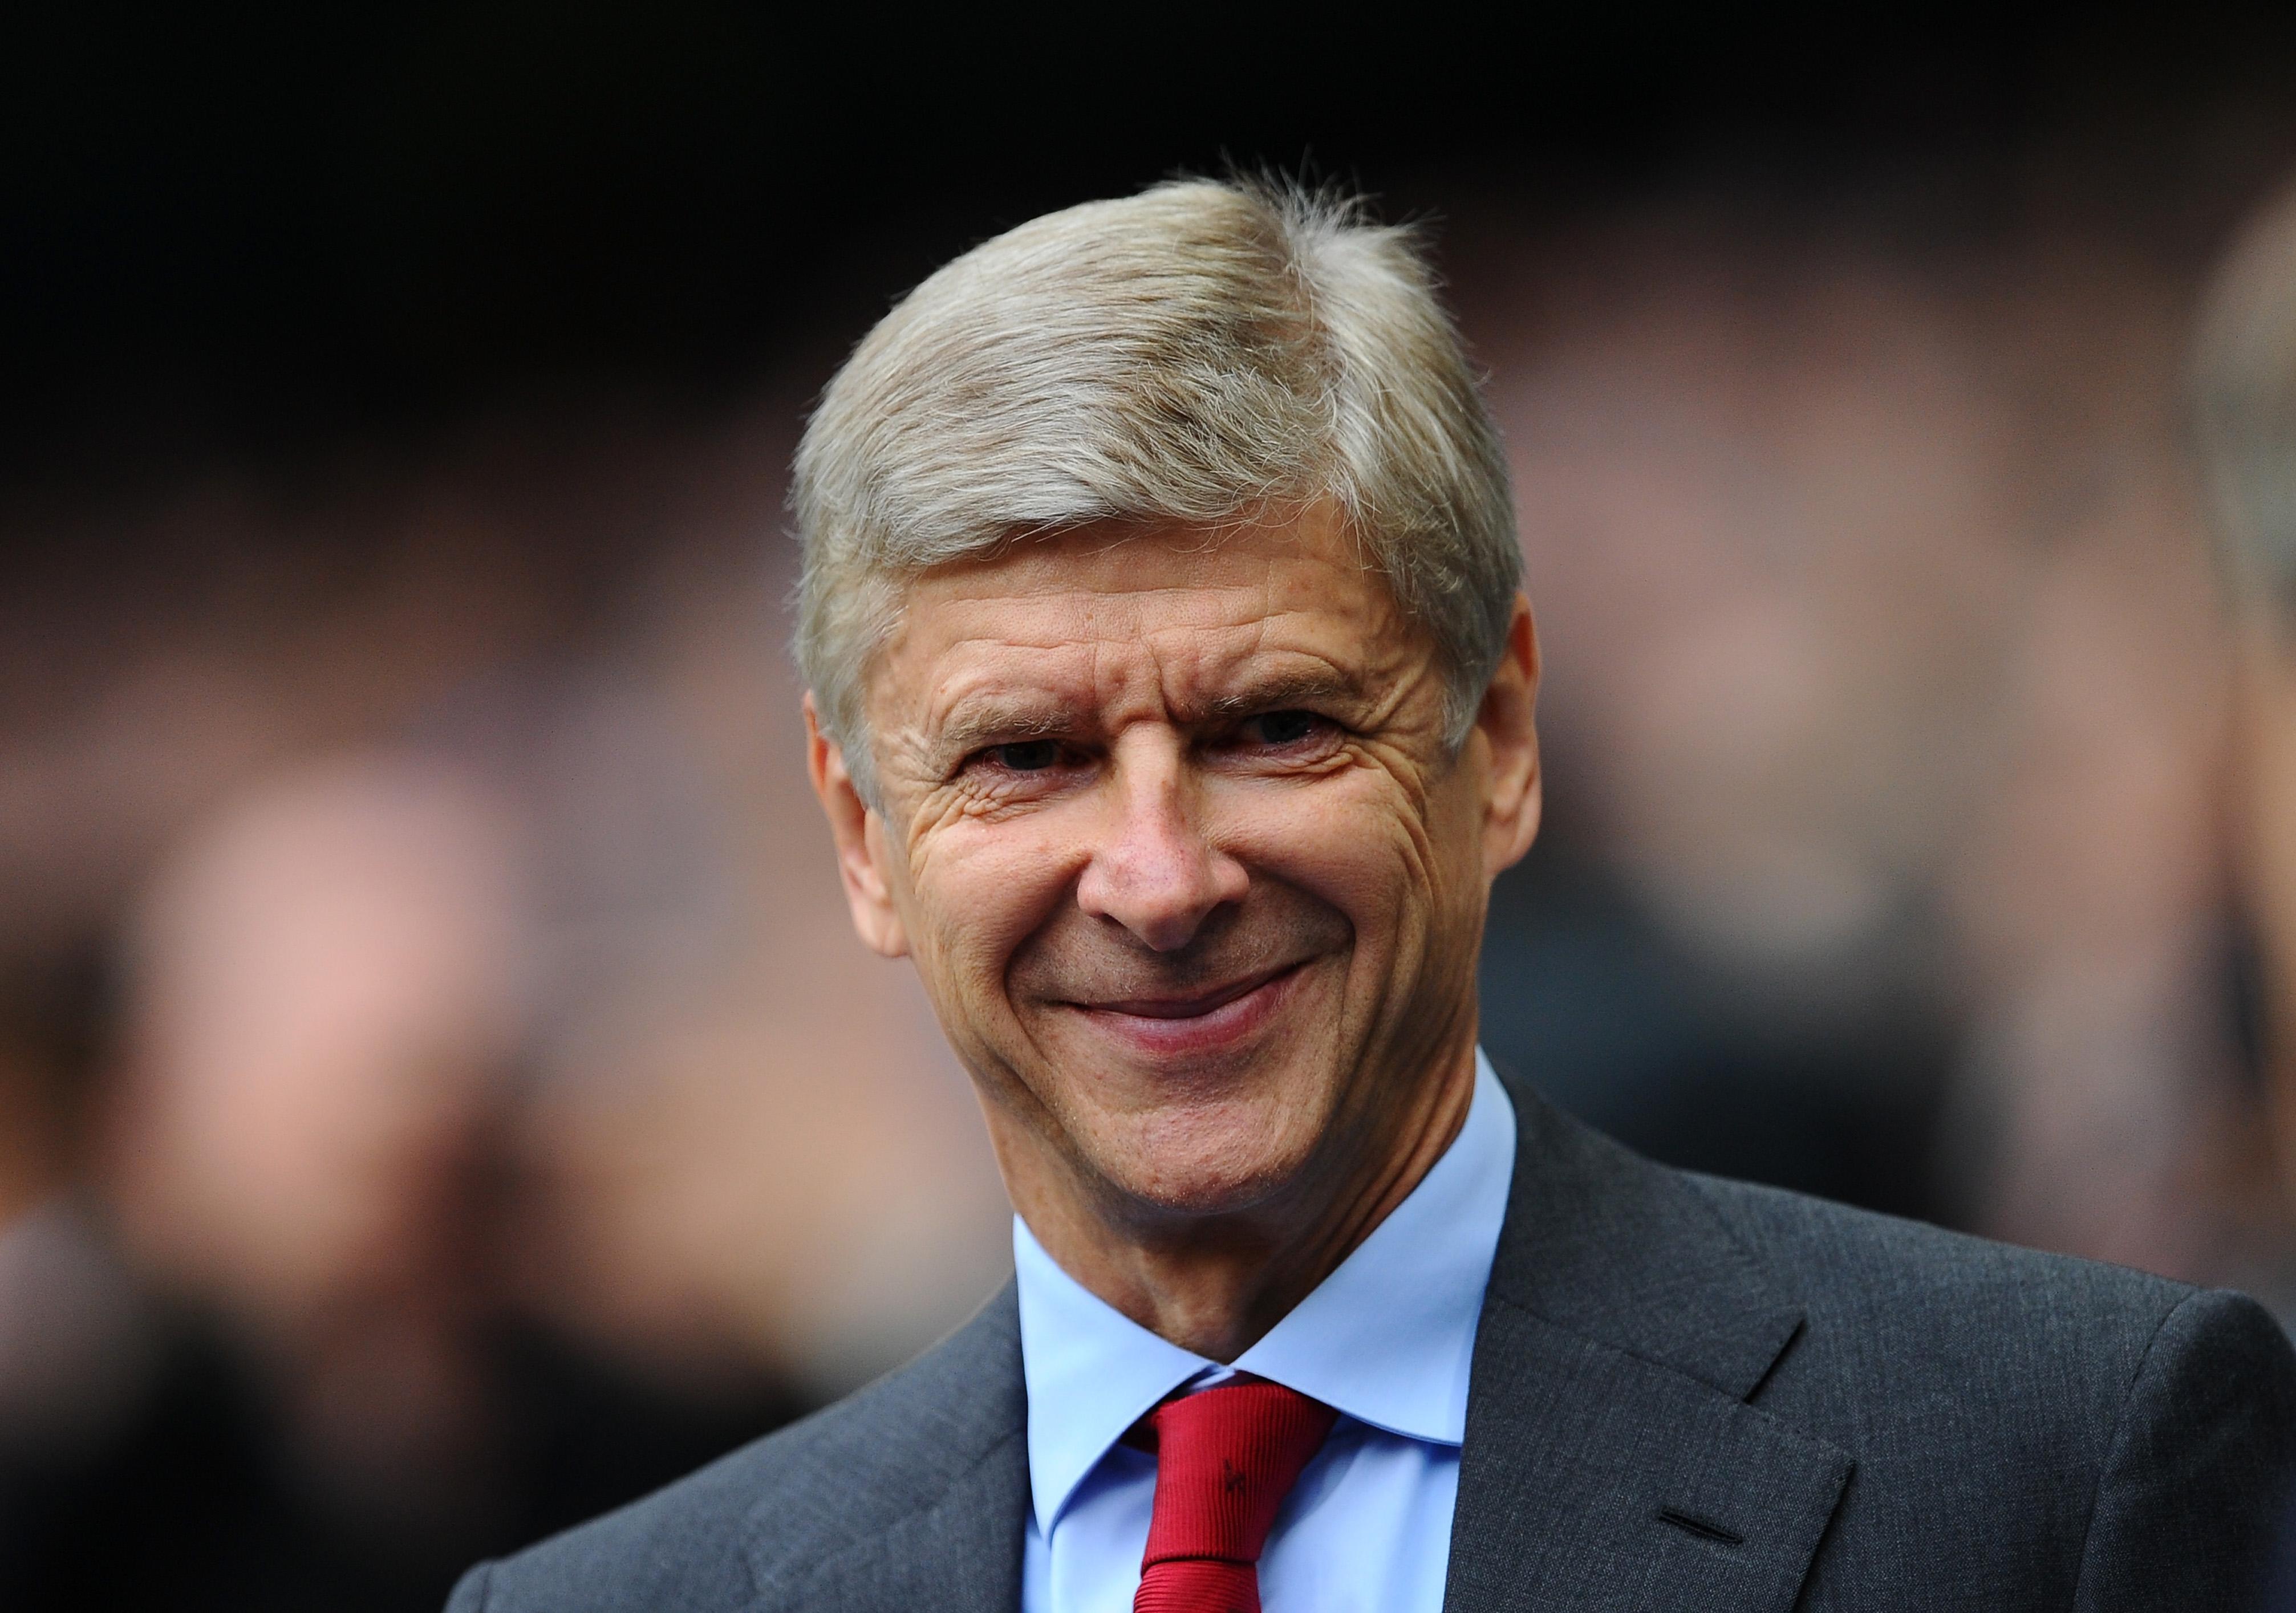 Arsene Wenger wary of Manchester United threat, despite Arsenal being favourites